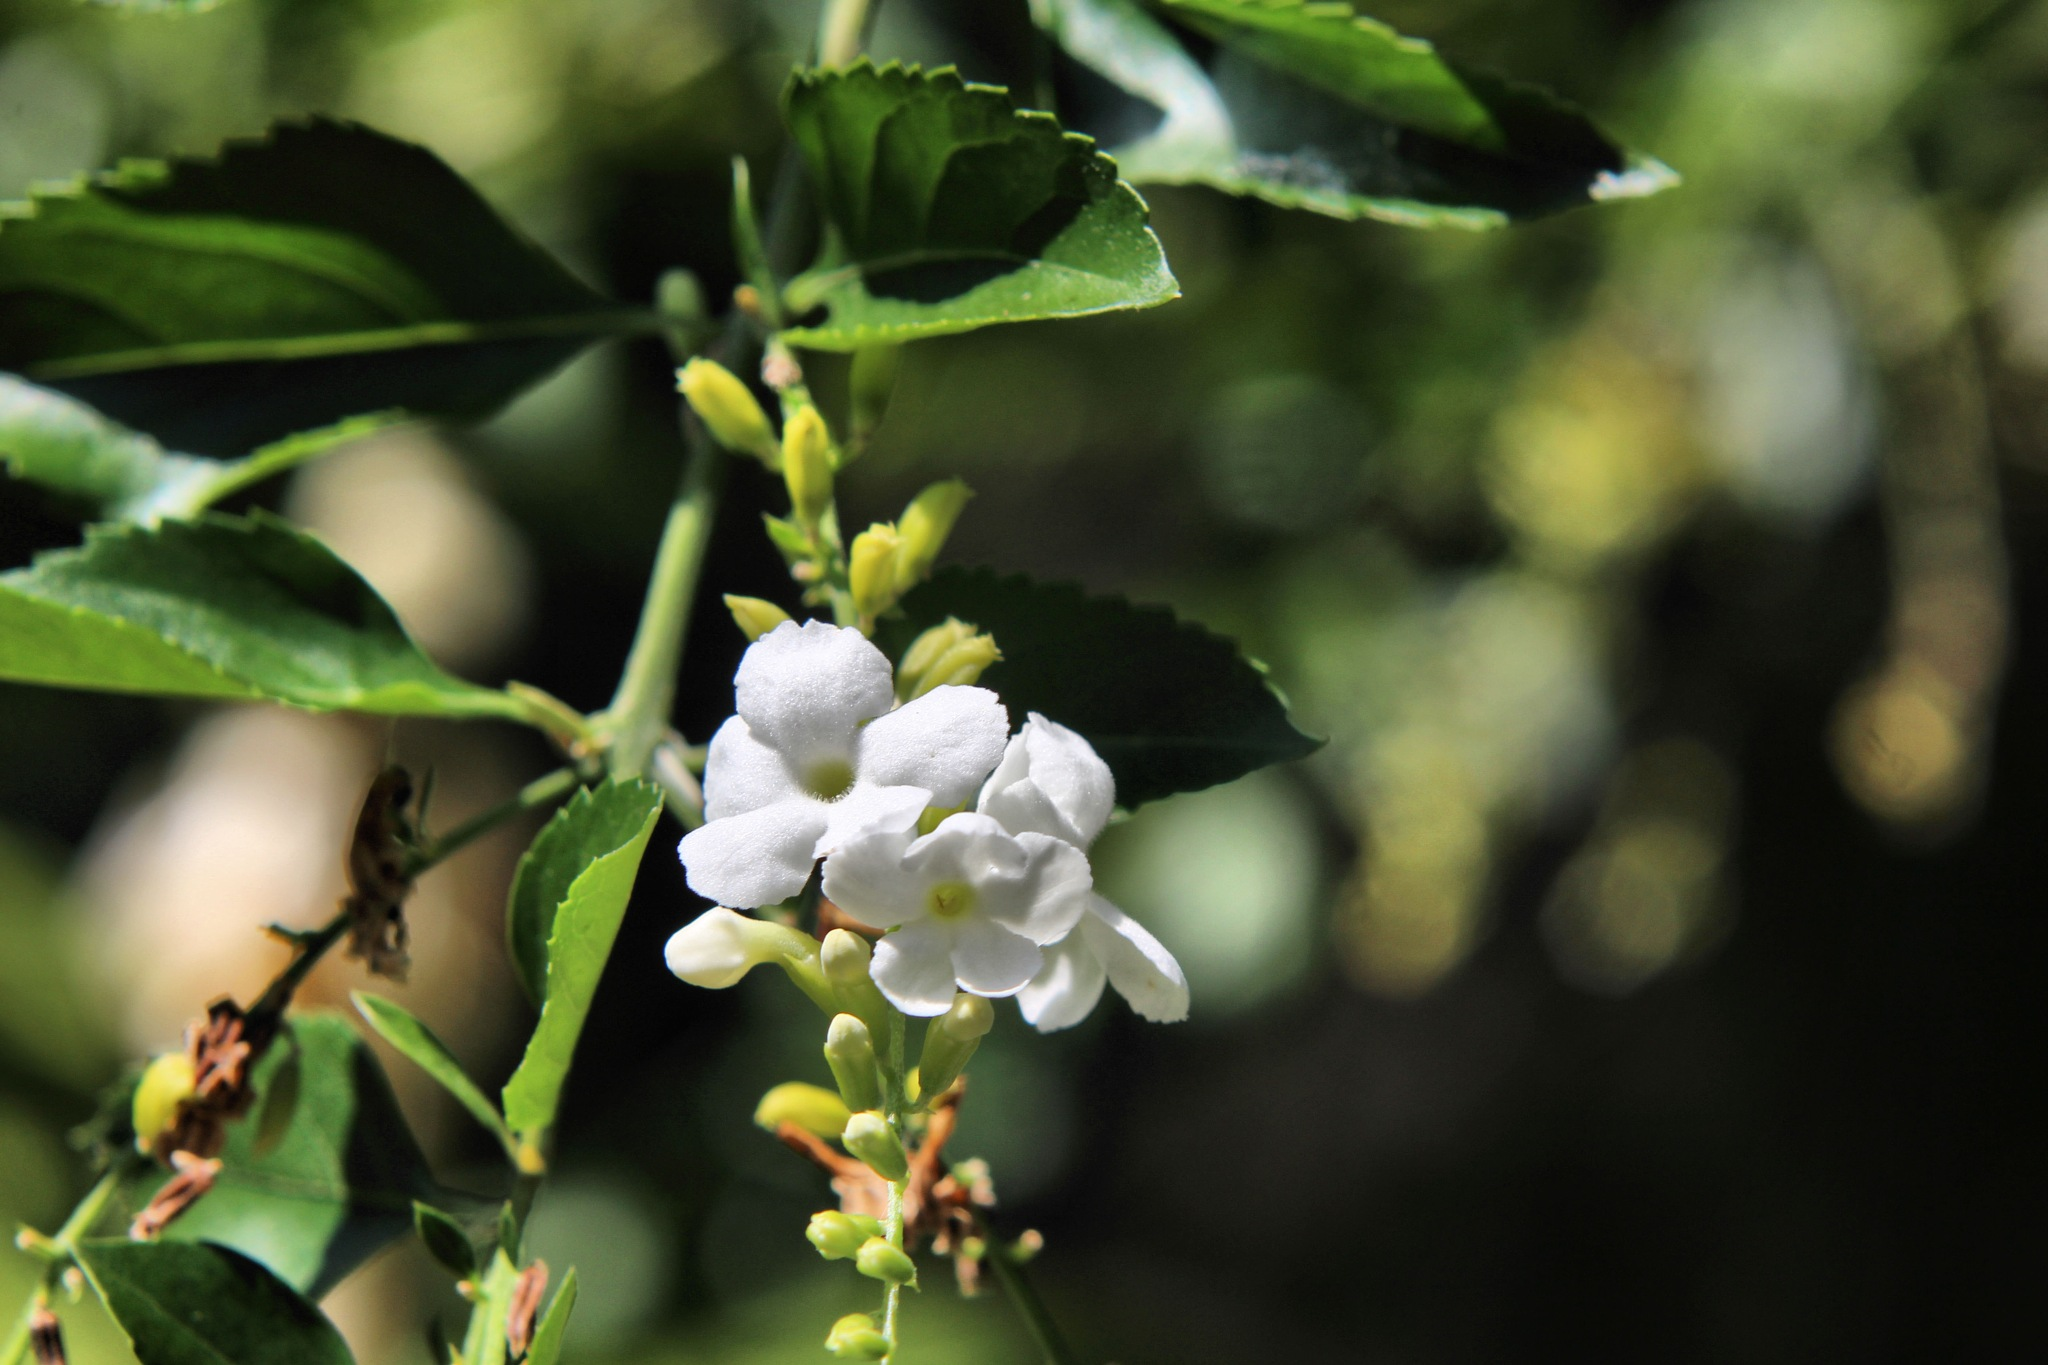 Flower in white by Jennifer Asher